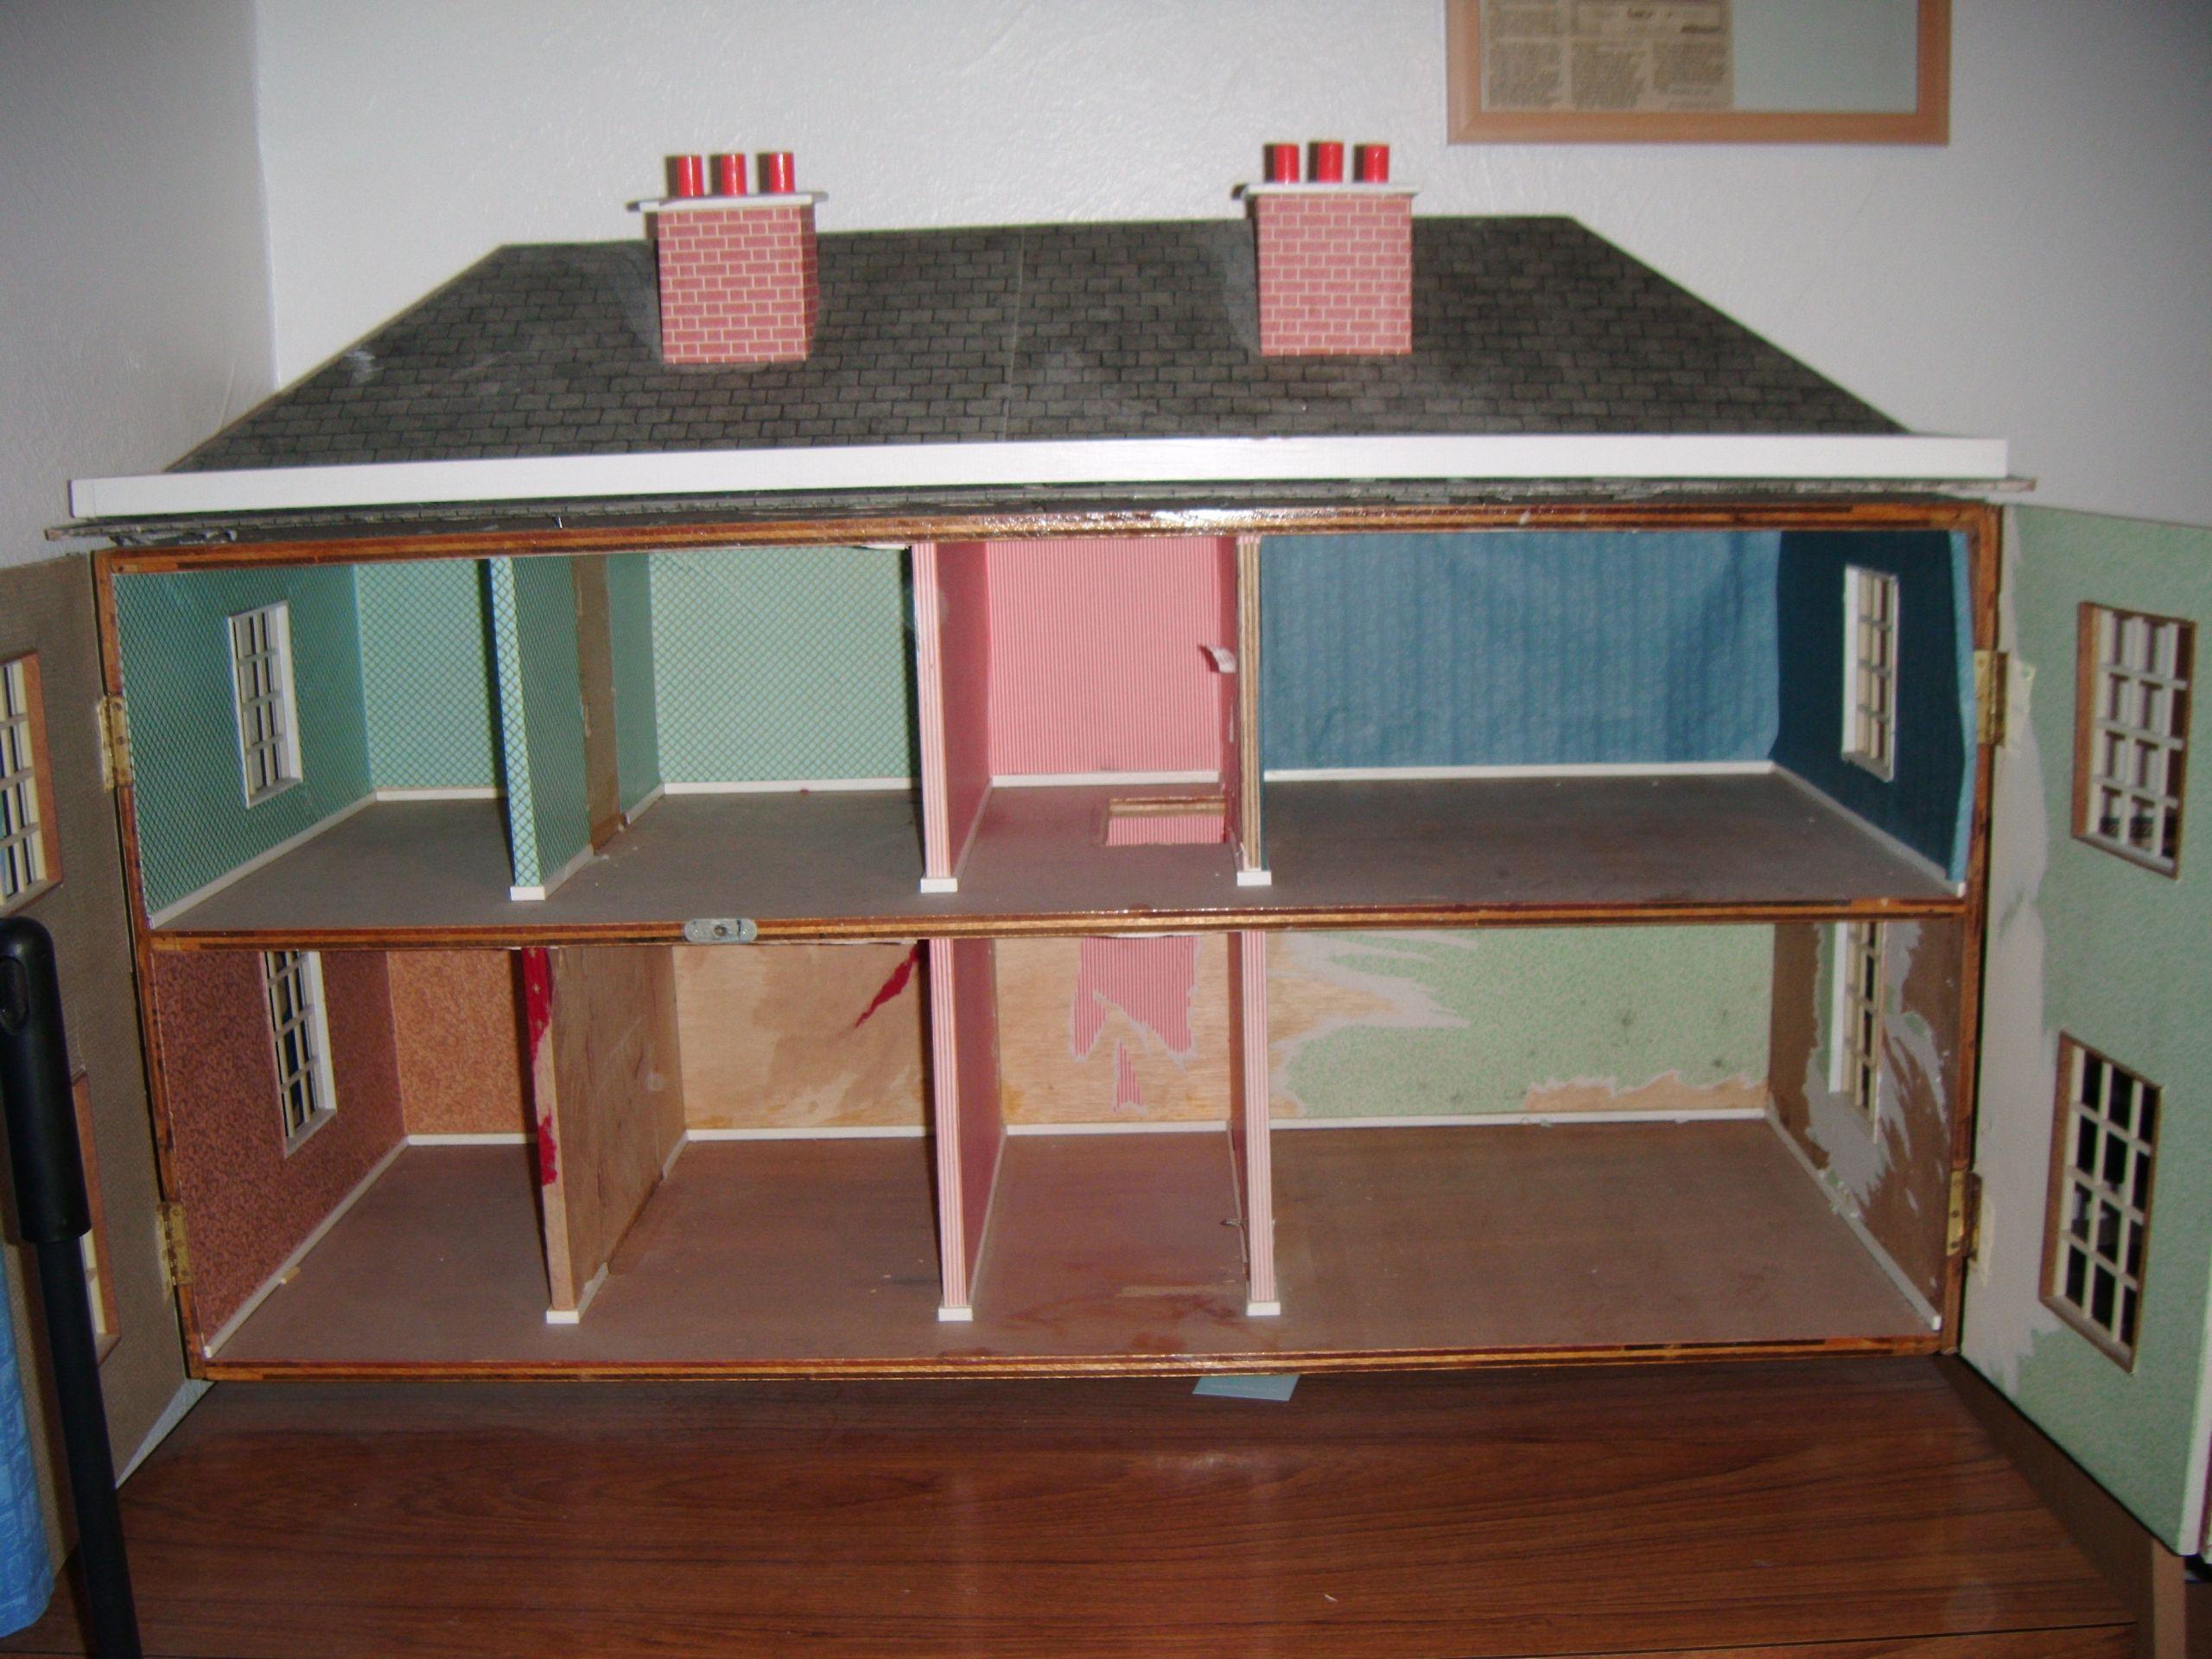 DIY Dollhouse Furniture Plans  Free pdf dollhouse furniture patterns books Plans DIY How